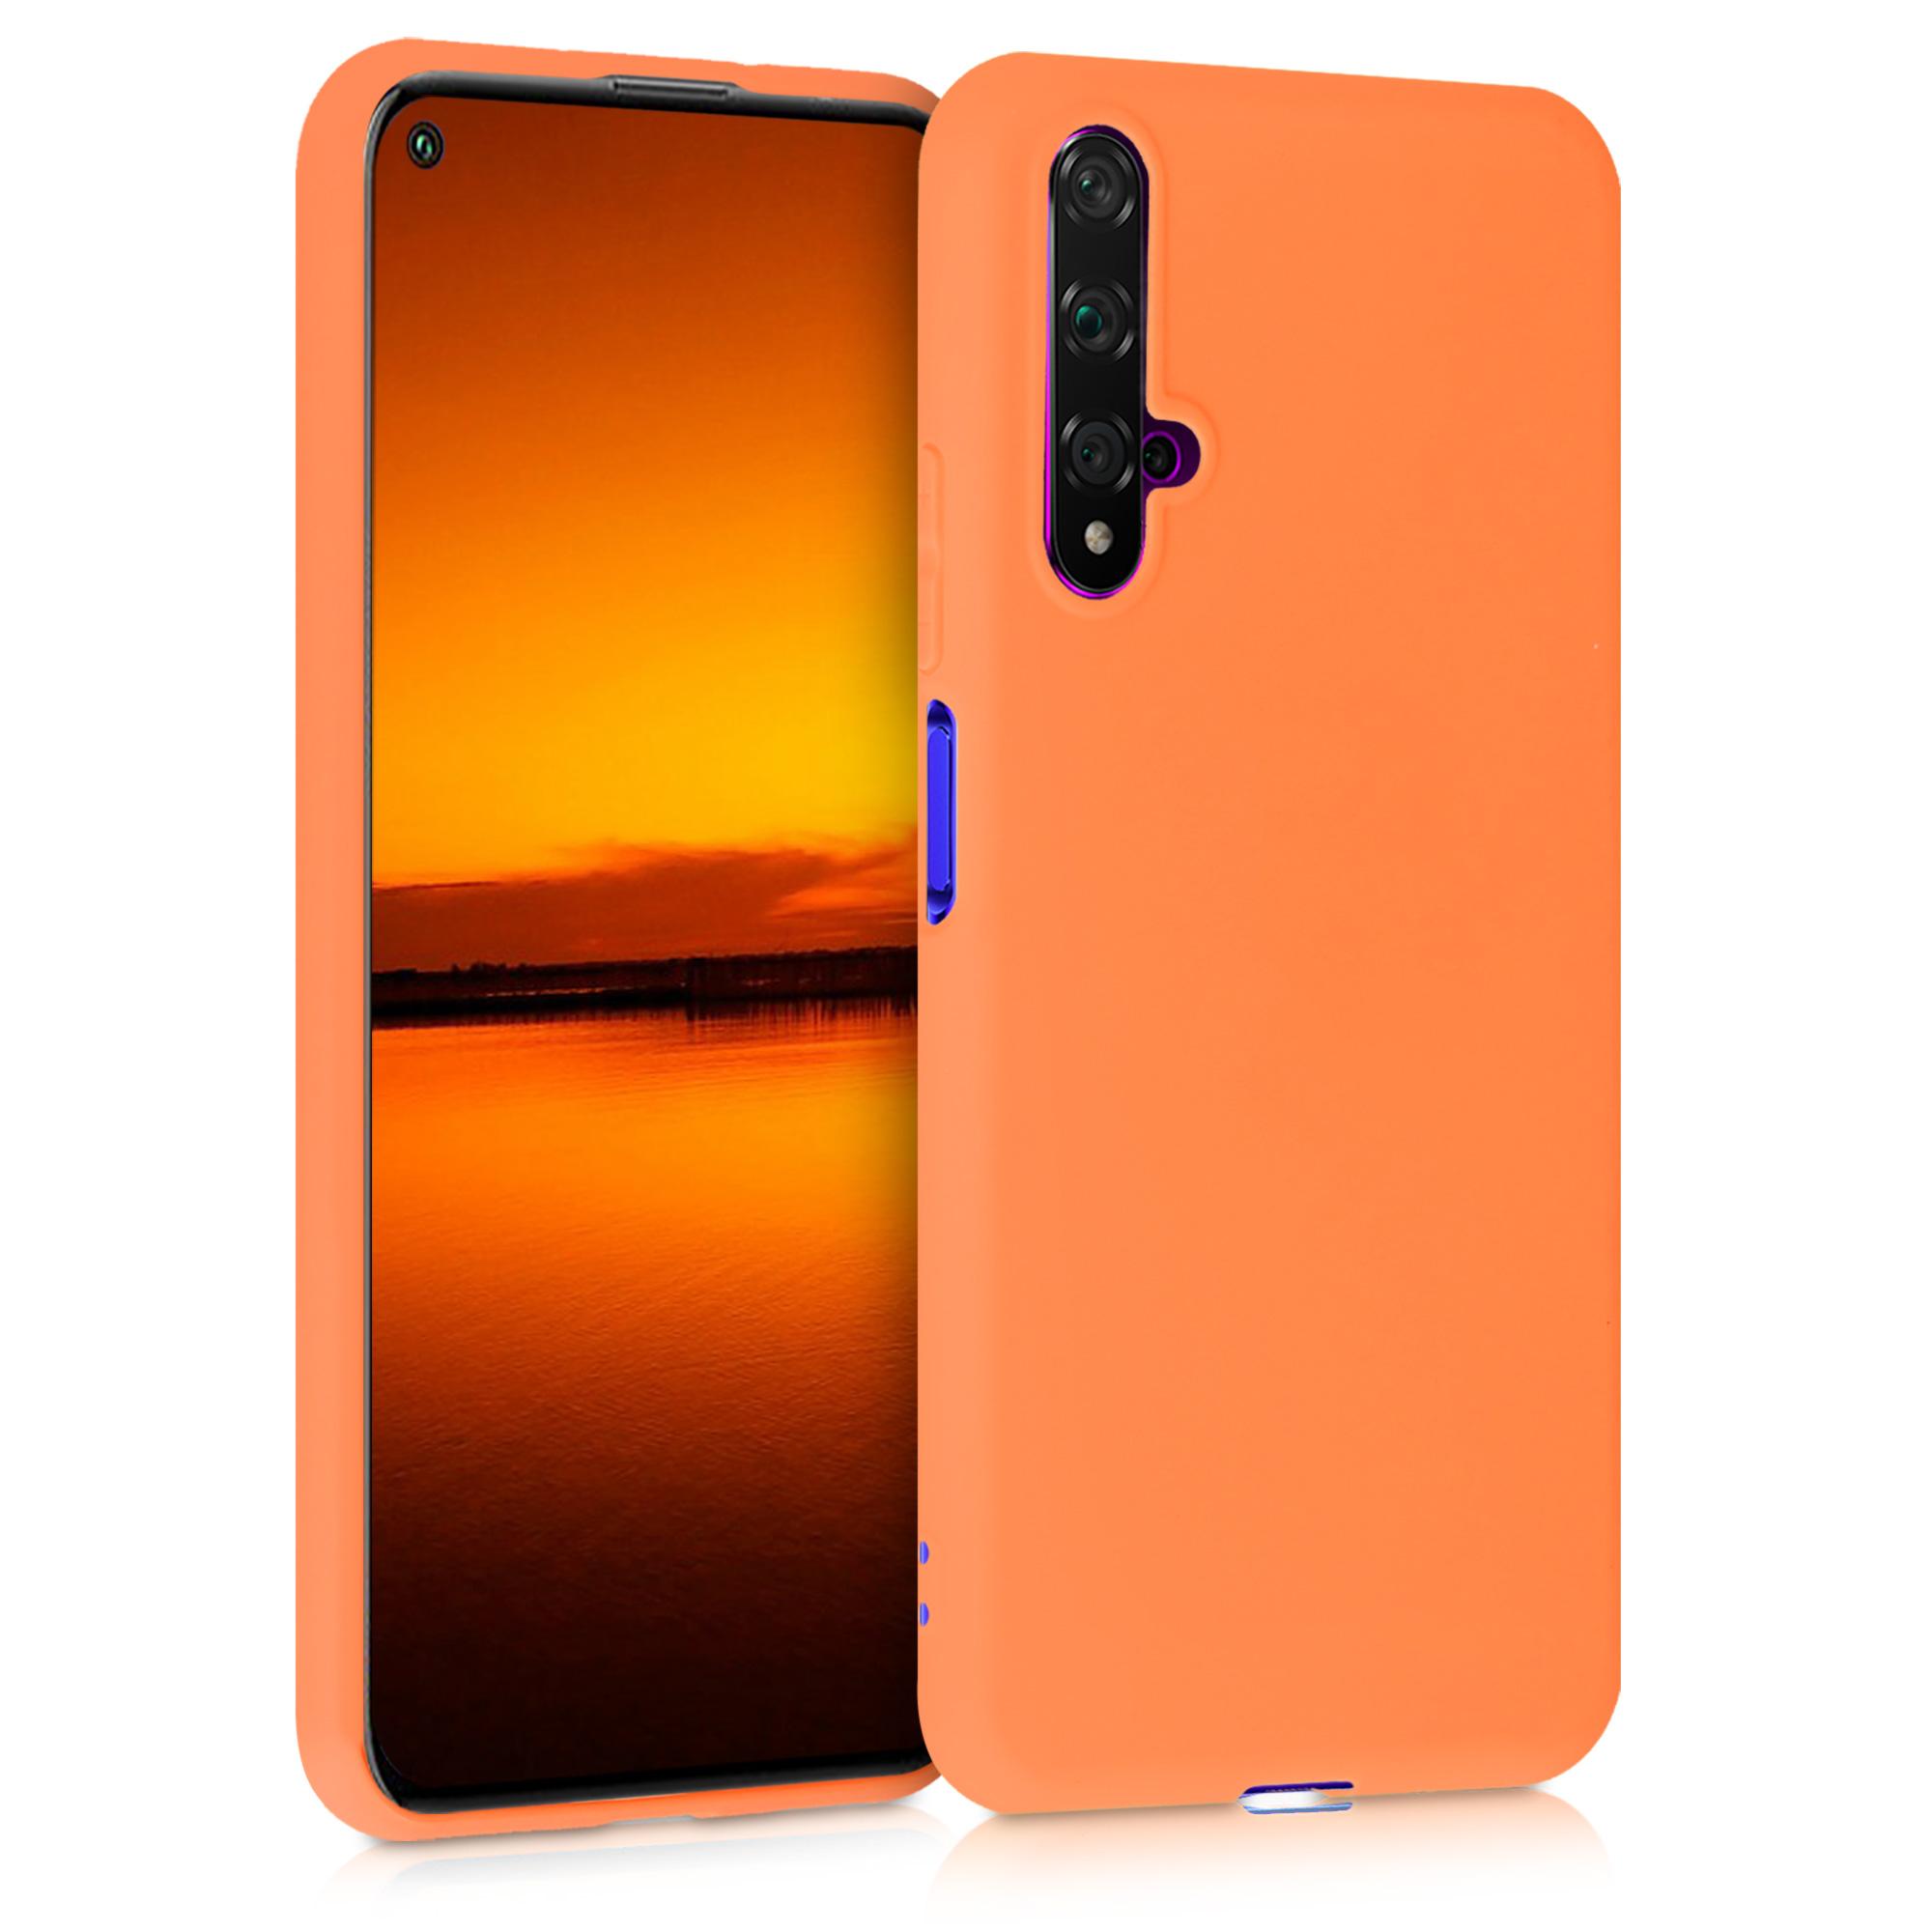 Oranžové silikonové pouzdro / obal pro Huawei Nova 5T